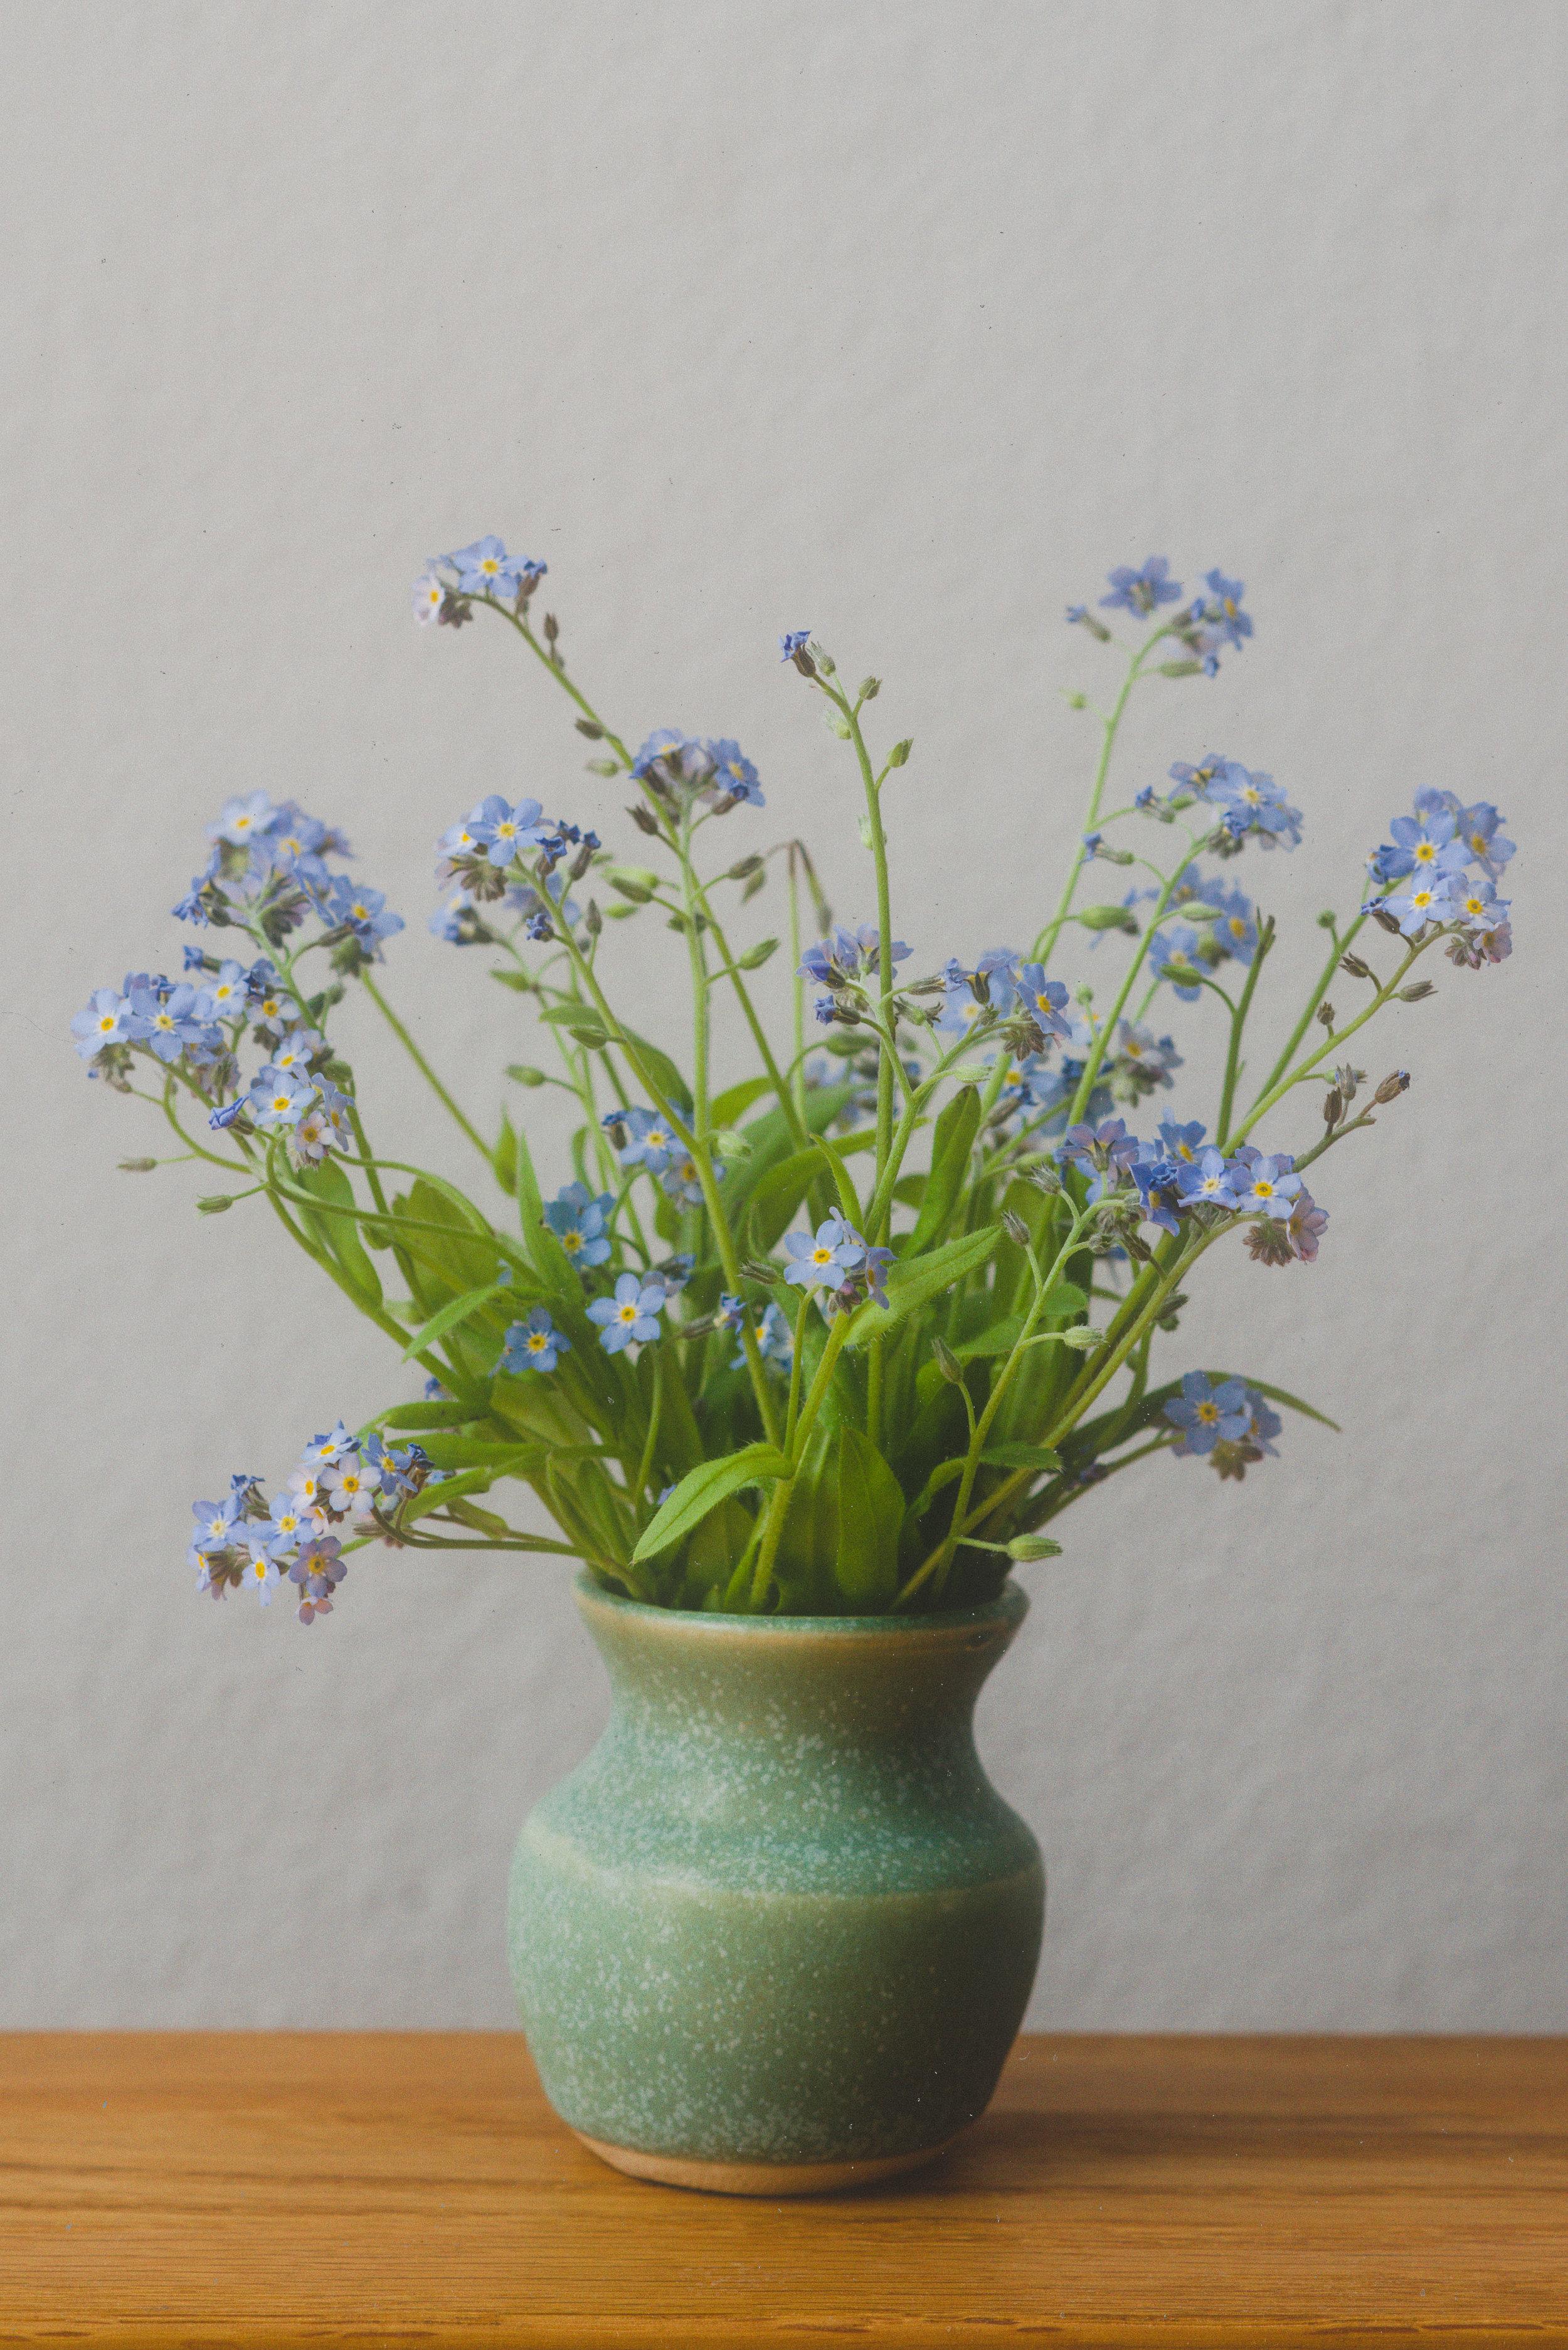 ryan thompson creative photography - lavender in tiny vase